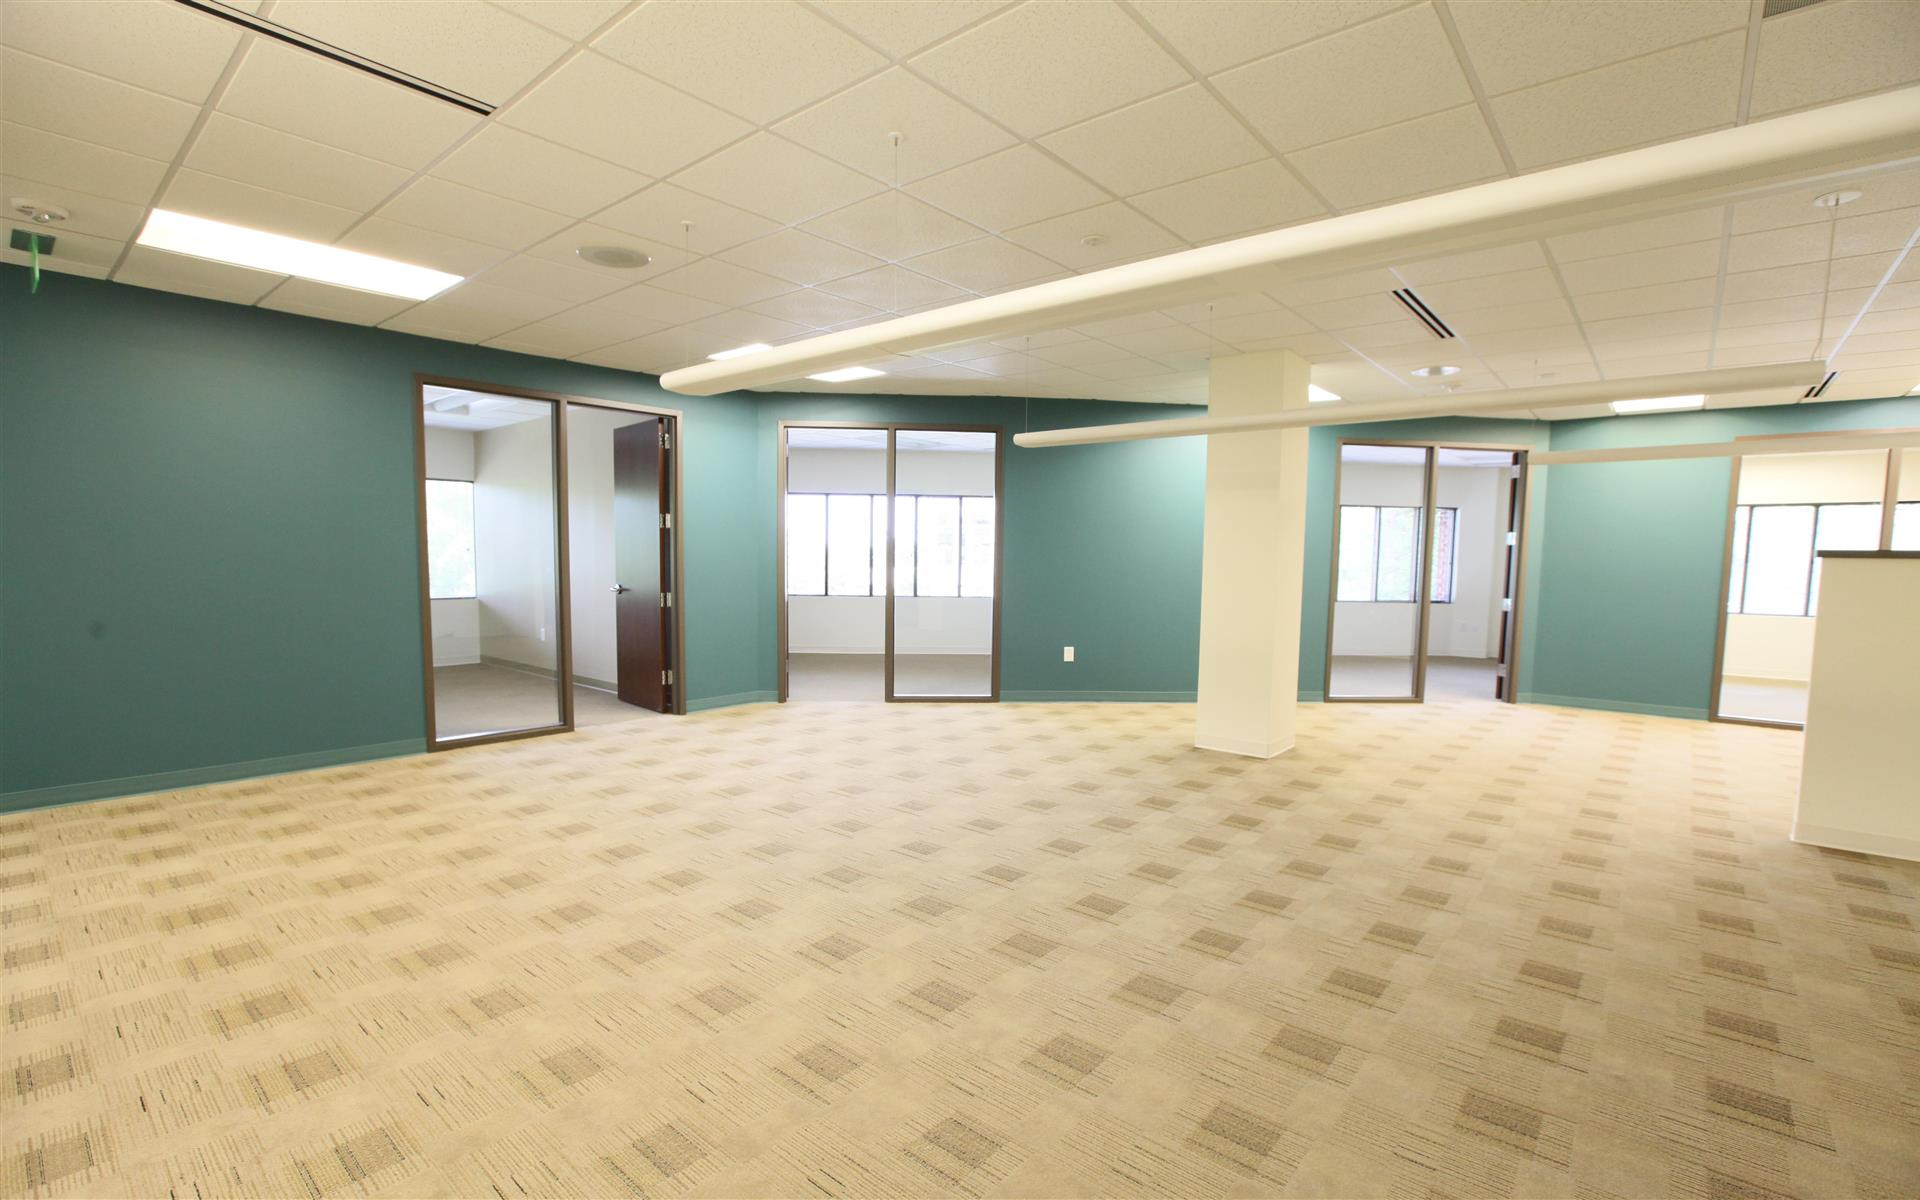 Highwoods | 3600 Glenwood Avenue - Team Space | Suite 205